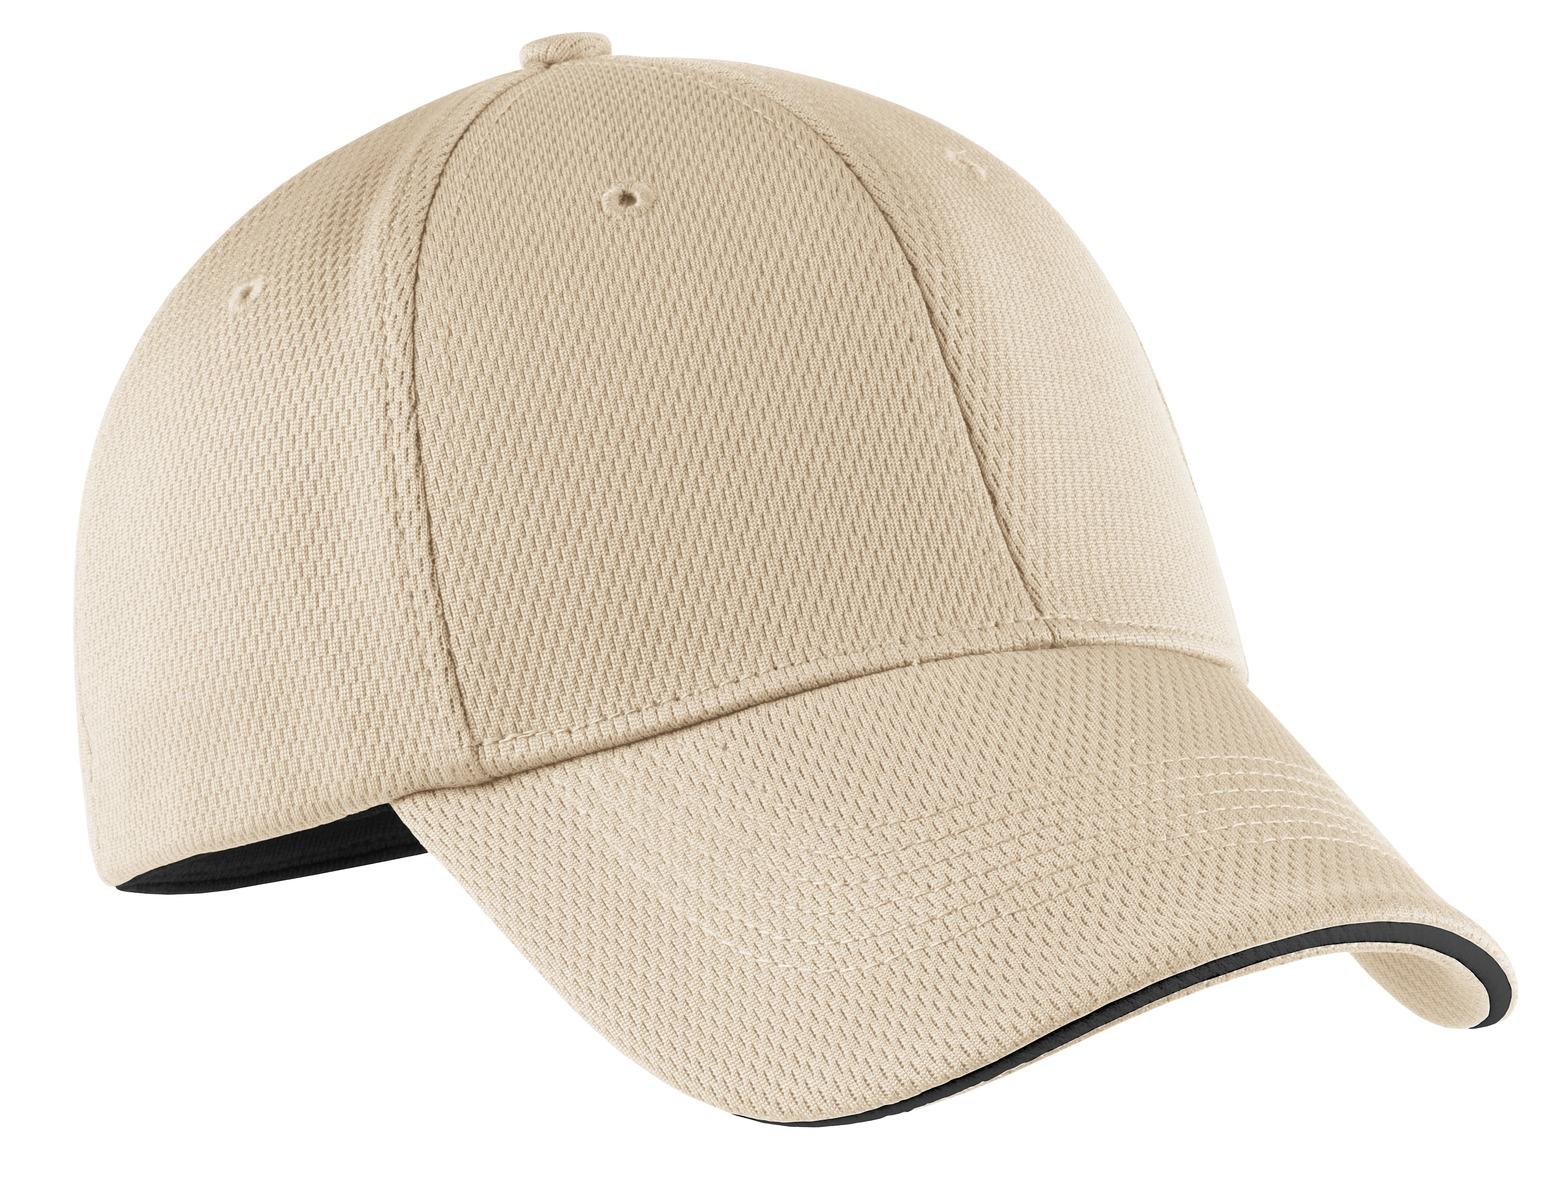 Nike Dri-FIT Mesh Swoosh Flex Sandwich Cap.-Promotional